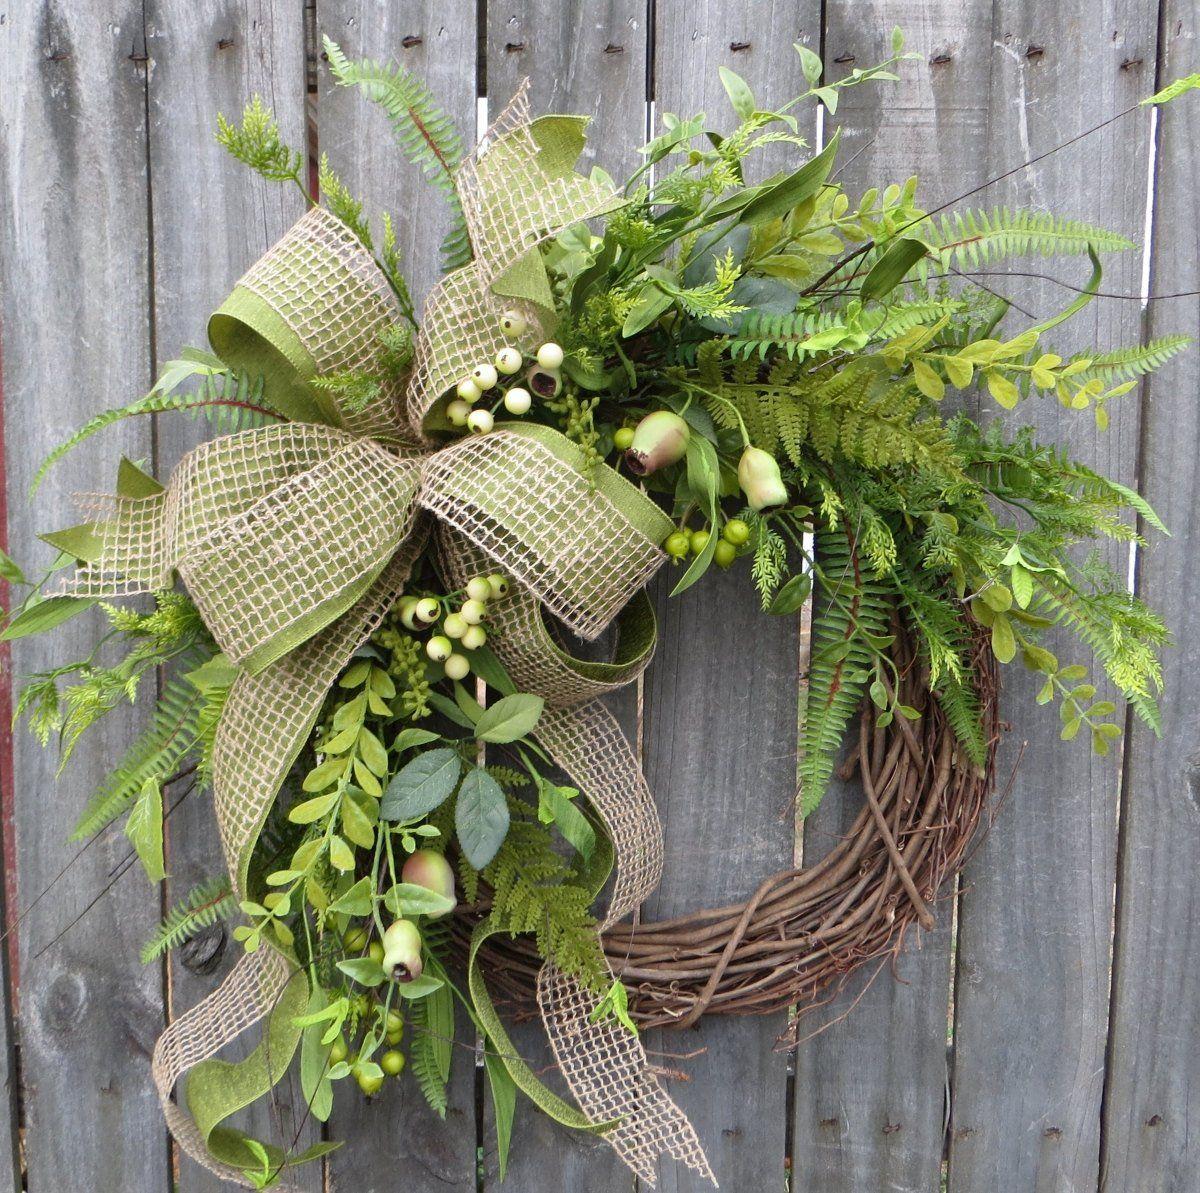 Year Round Wreath Burlap Winter Wreath Burlap Wreath Spring Wreath Front Door Wreath Everyday Wreath